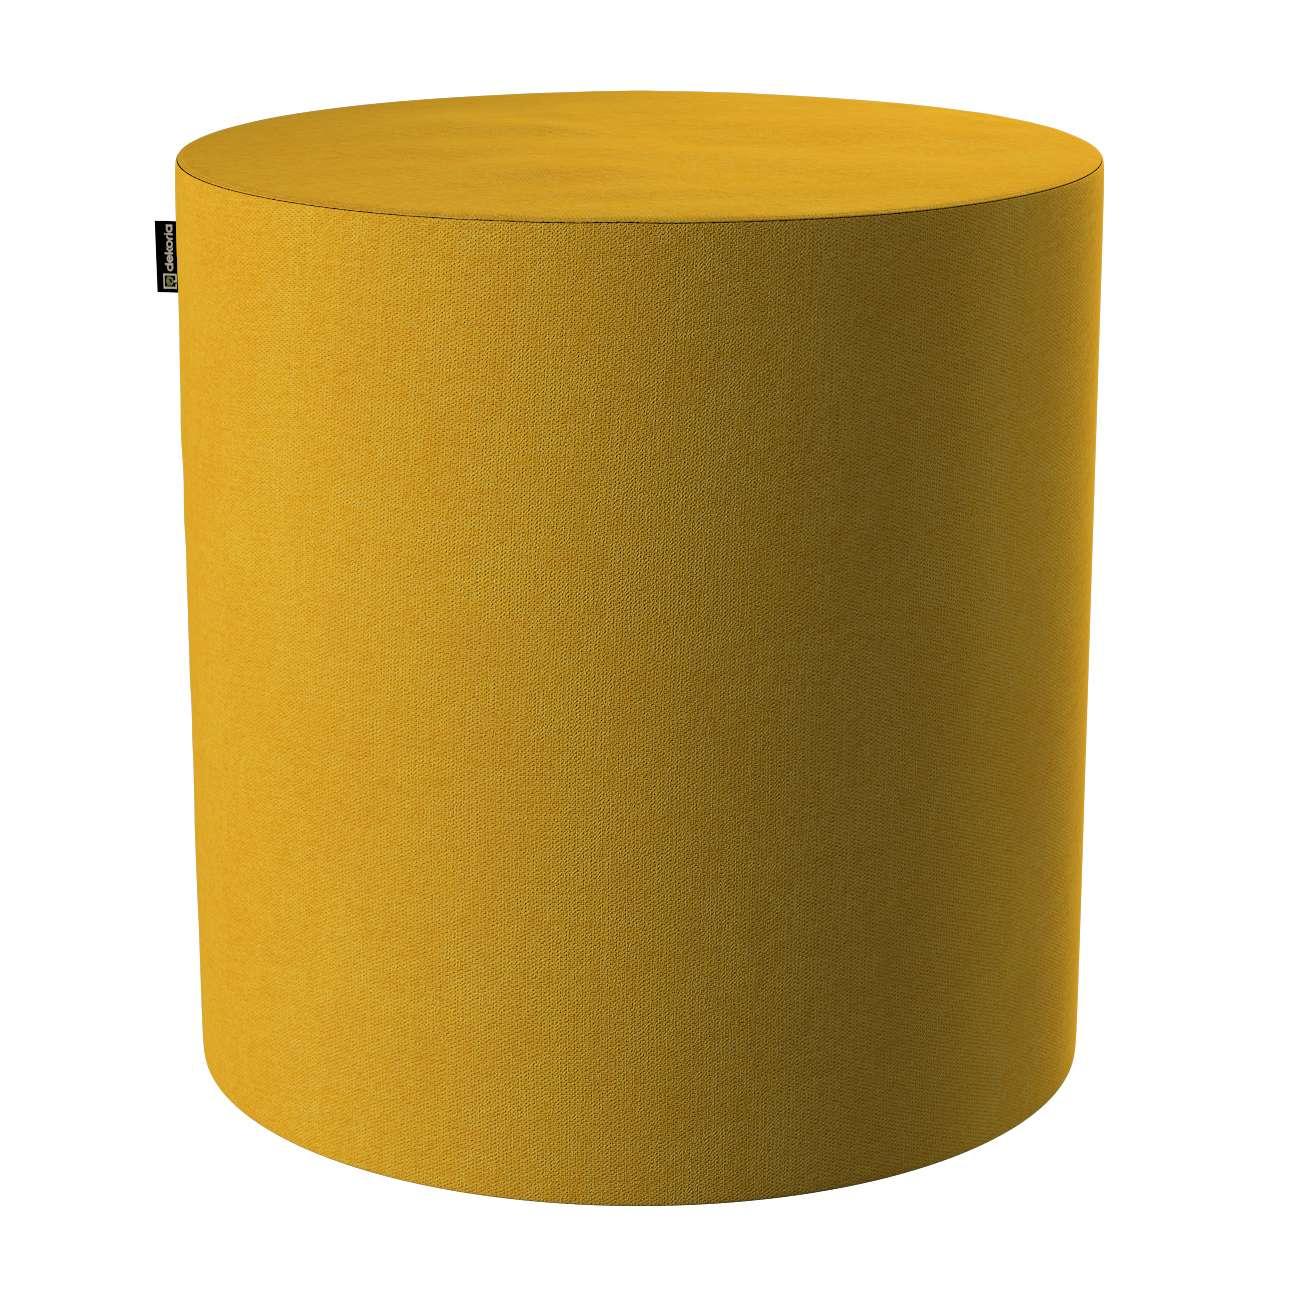 Pouf Barrel von der Kollektion Etna, Stoff: 705-04